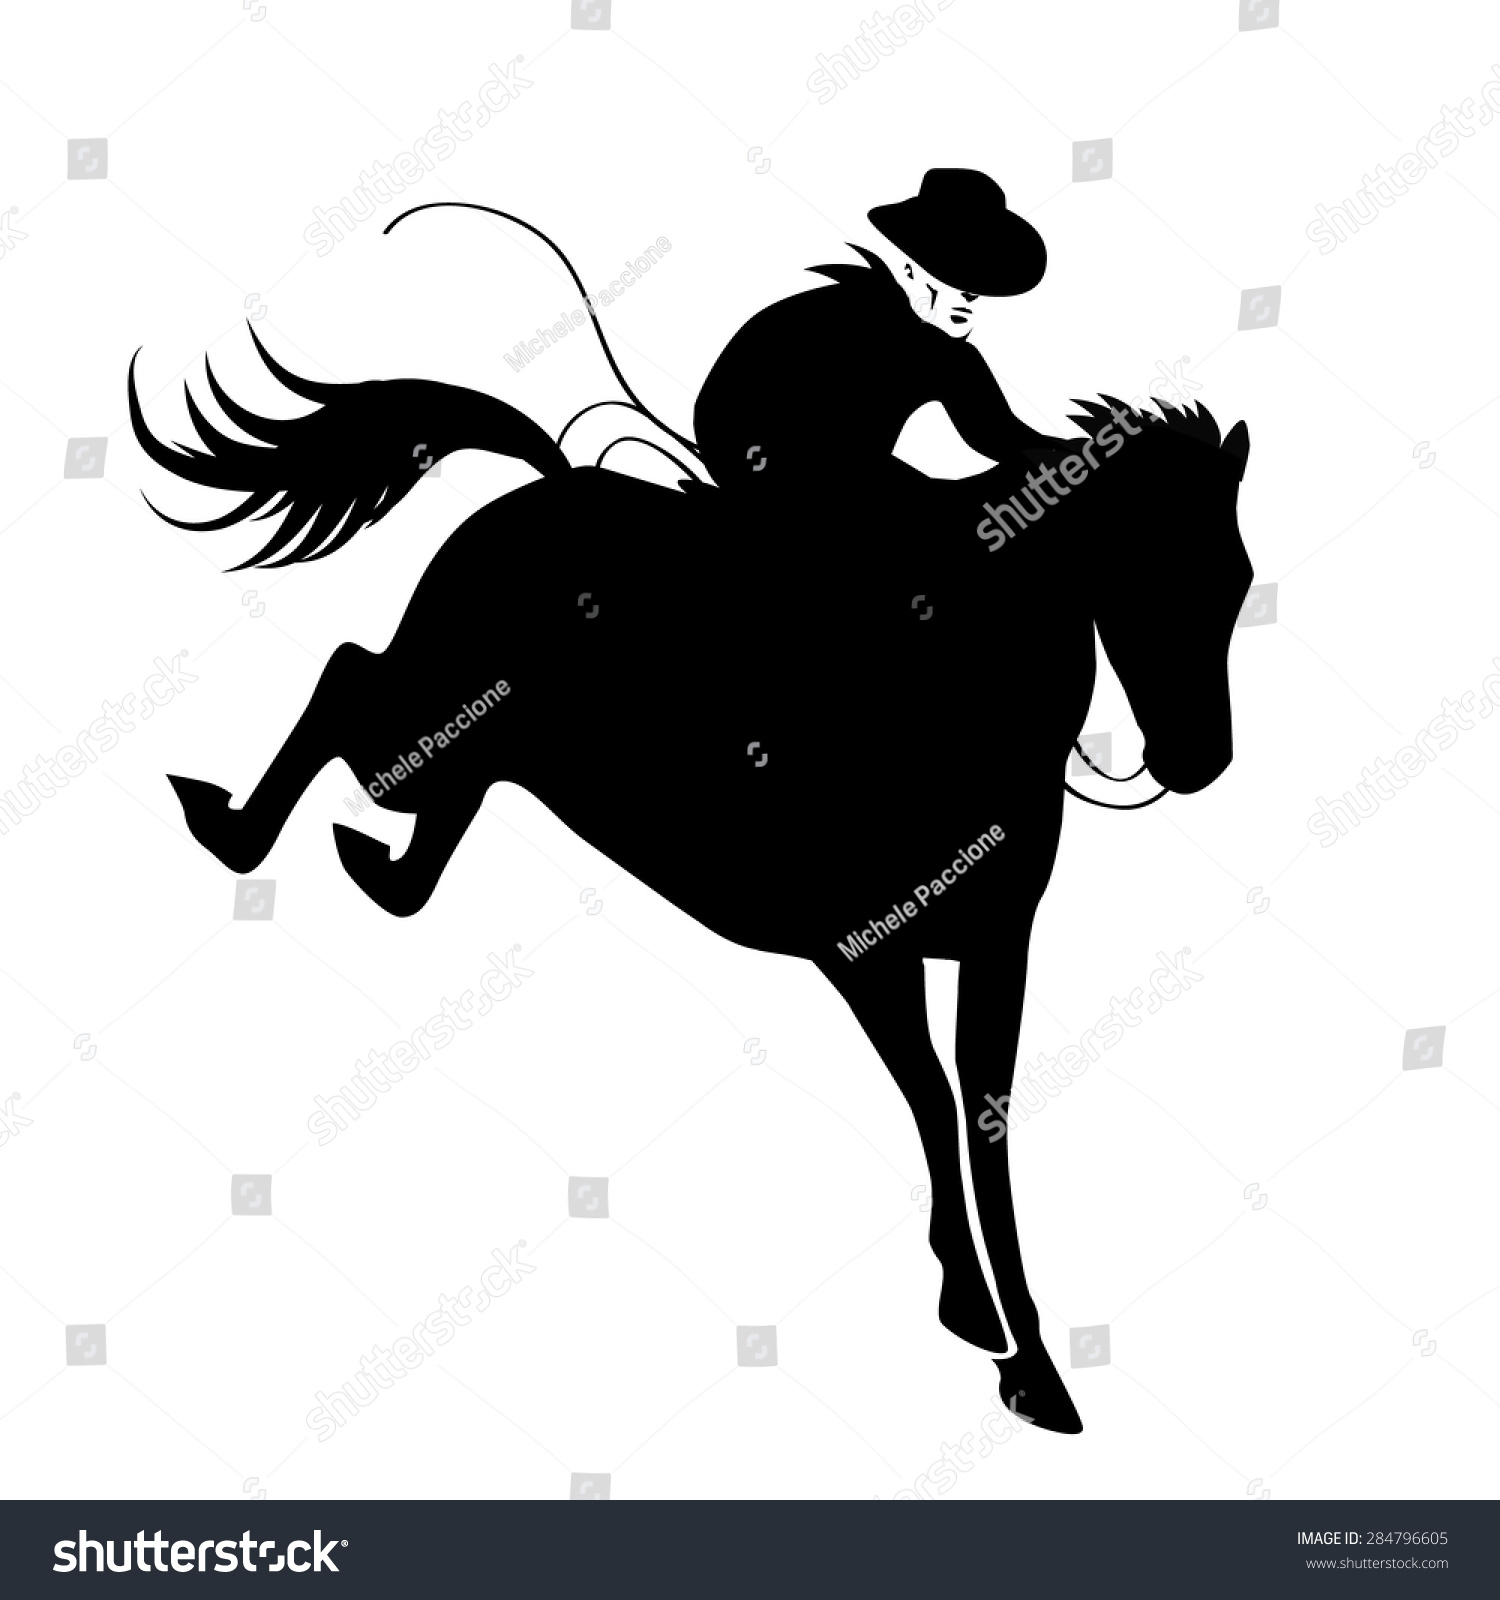 Rodeo Bucking Bronco Icon Silhouette Eps Stock Vector ...